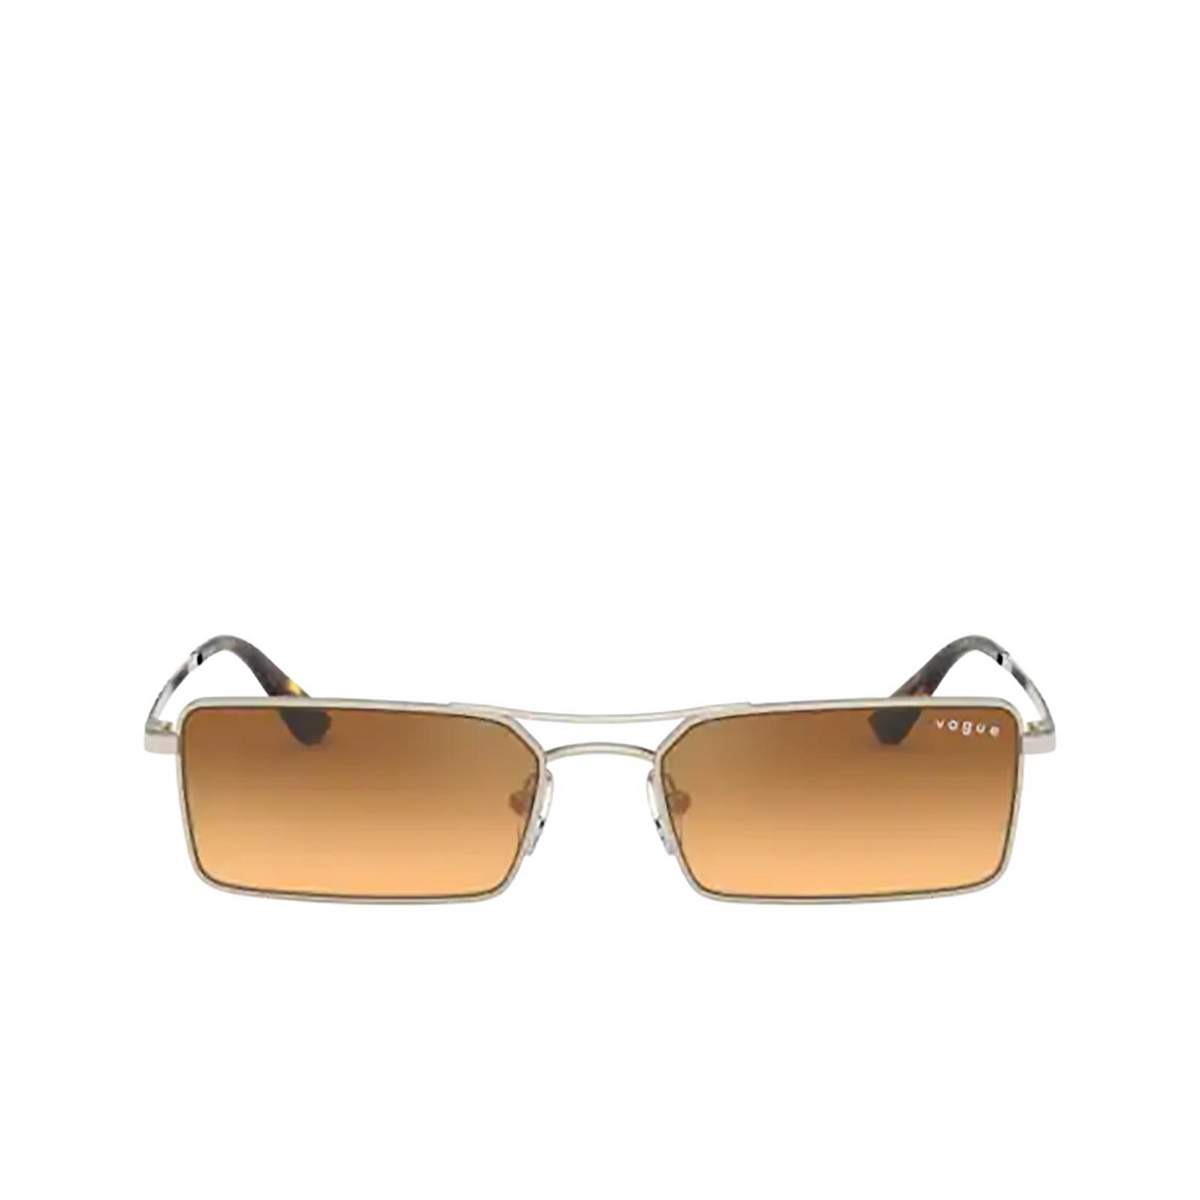 Vogue® Rectangle Sunglasses: VO4106SM color Pale Gold 848/7H - front view.